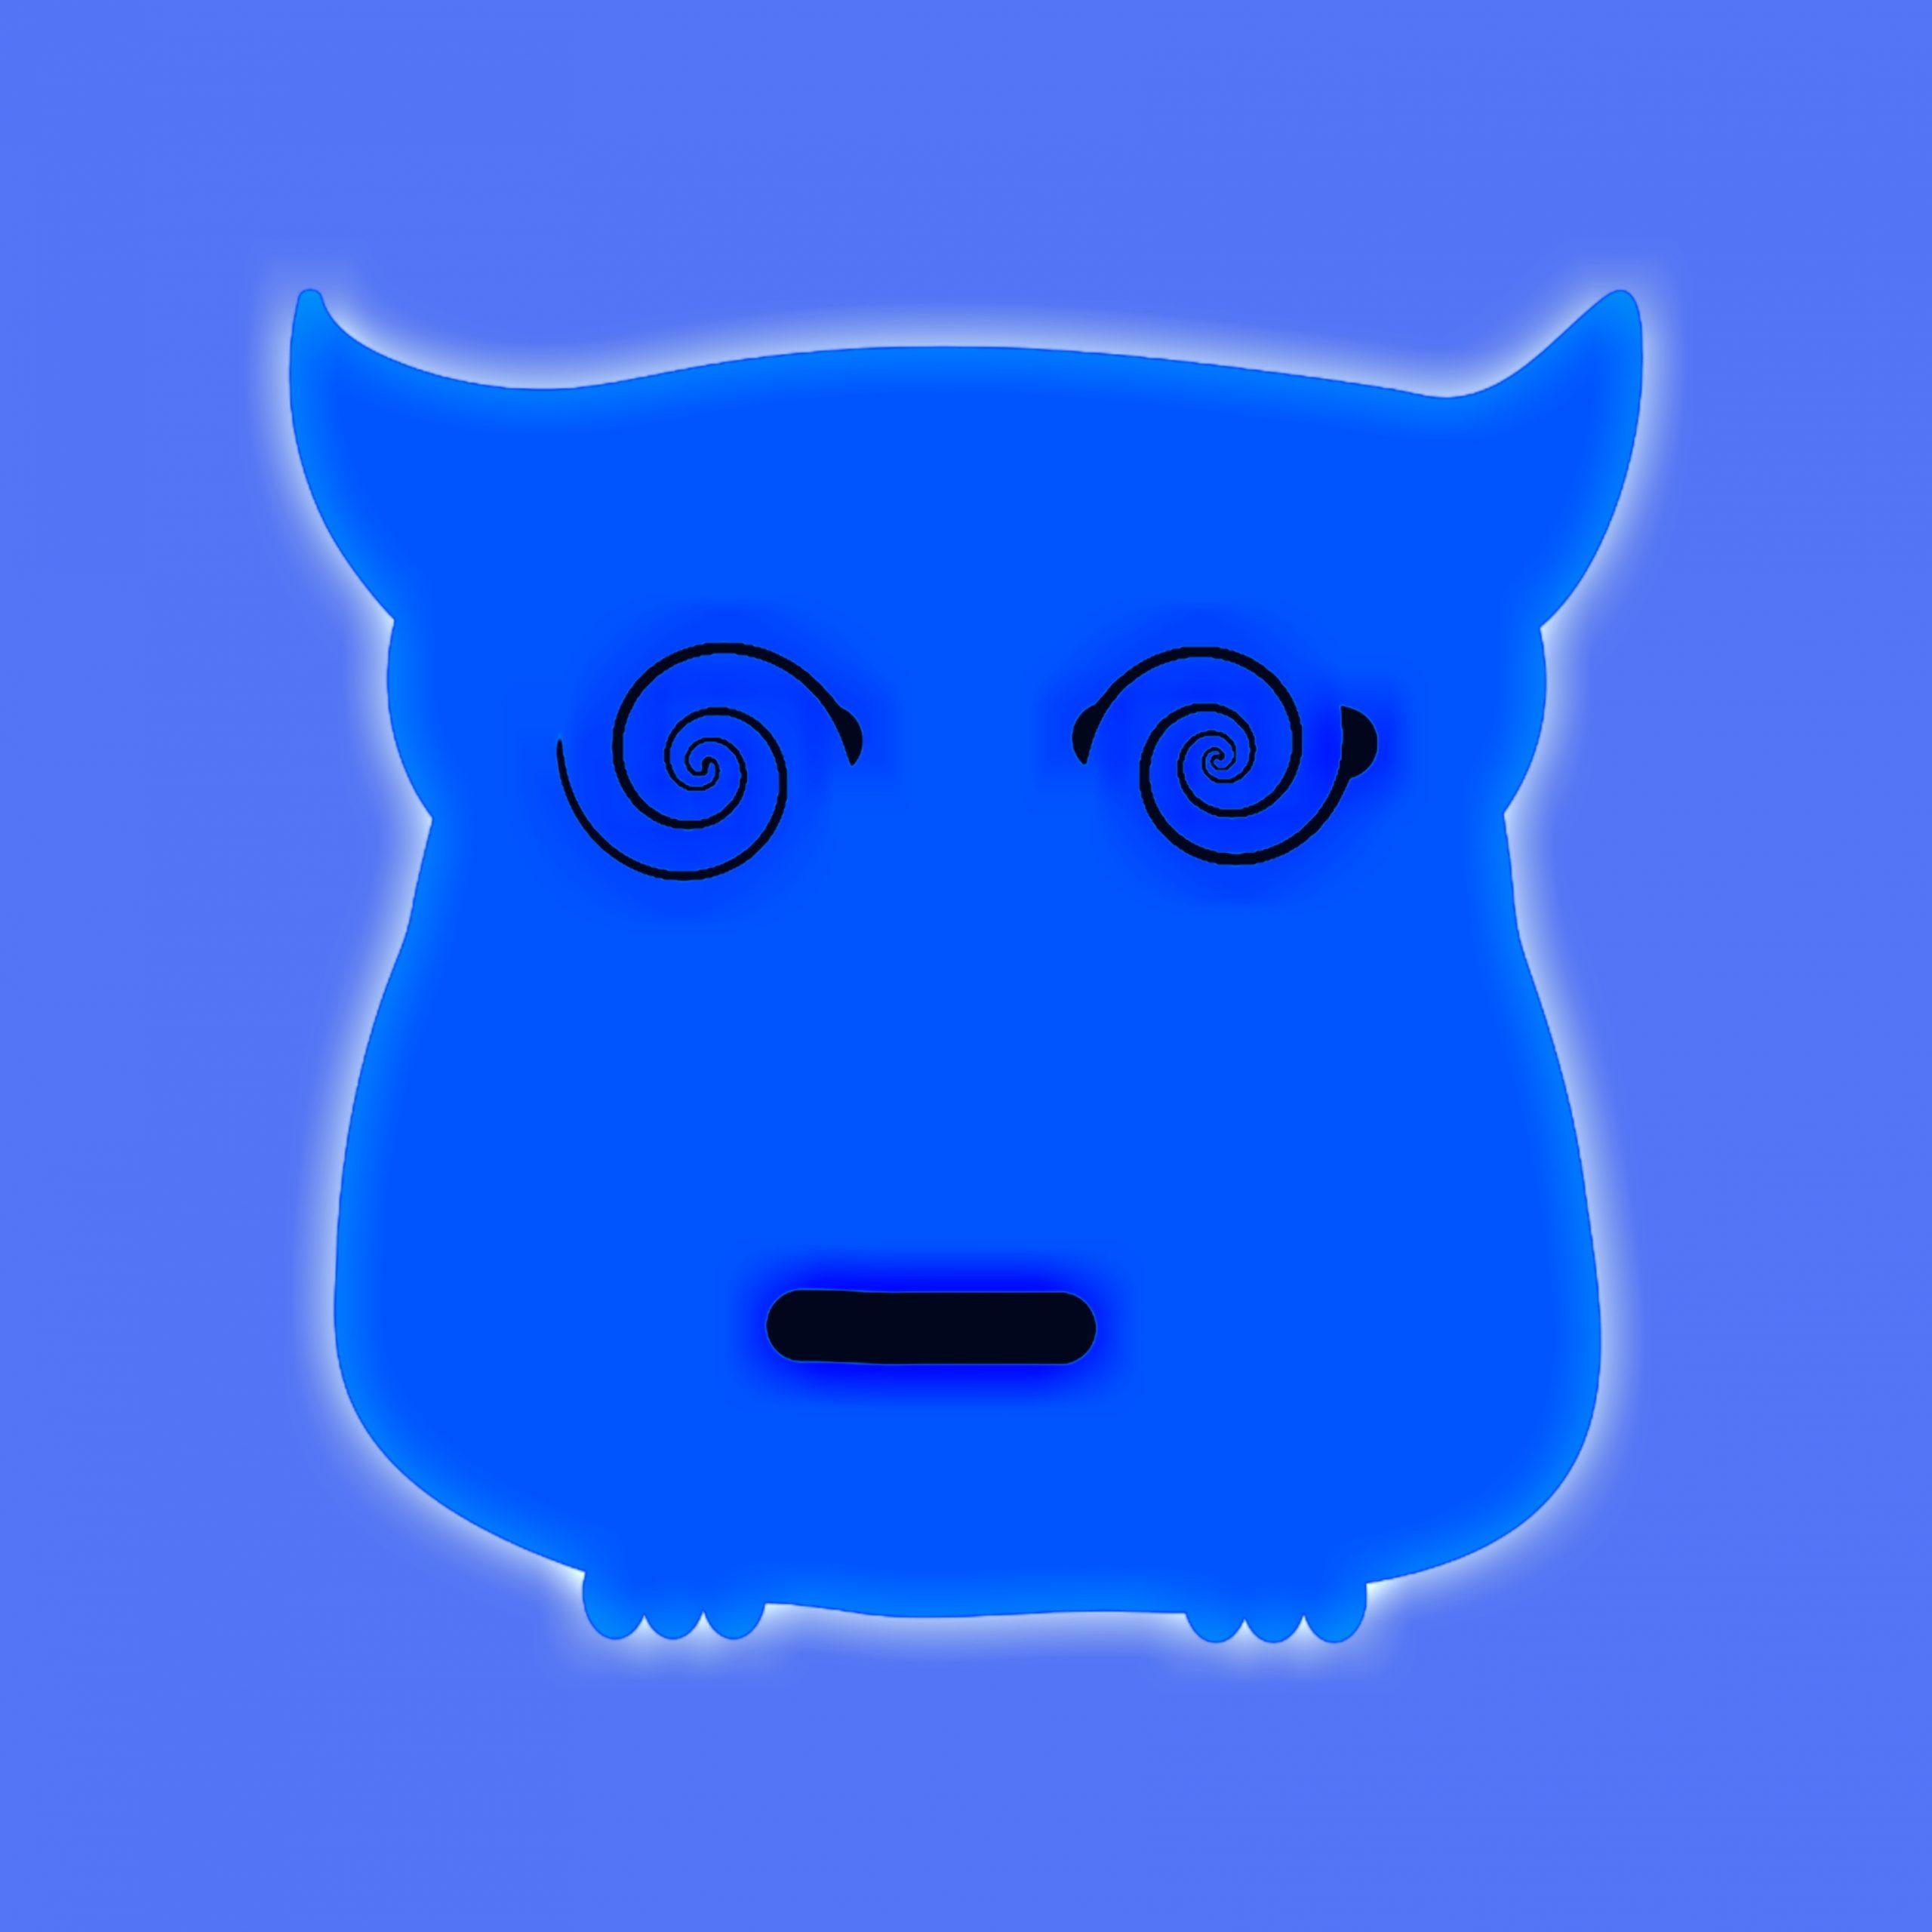 A cat face illustration